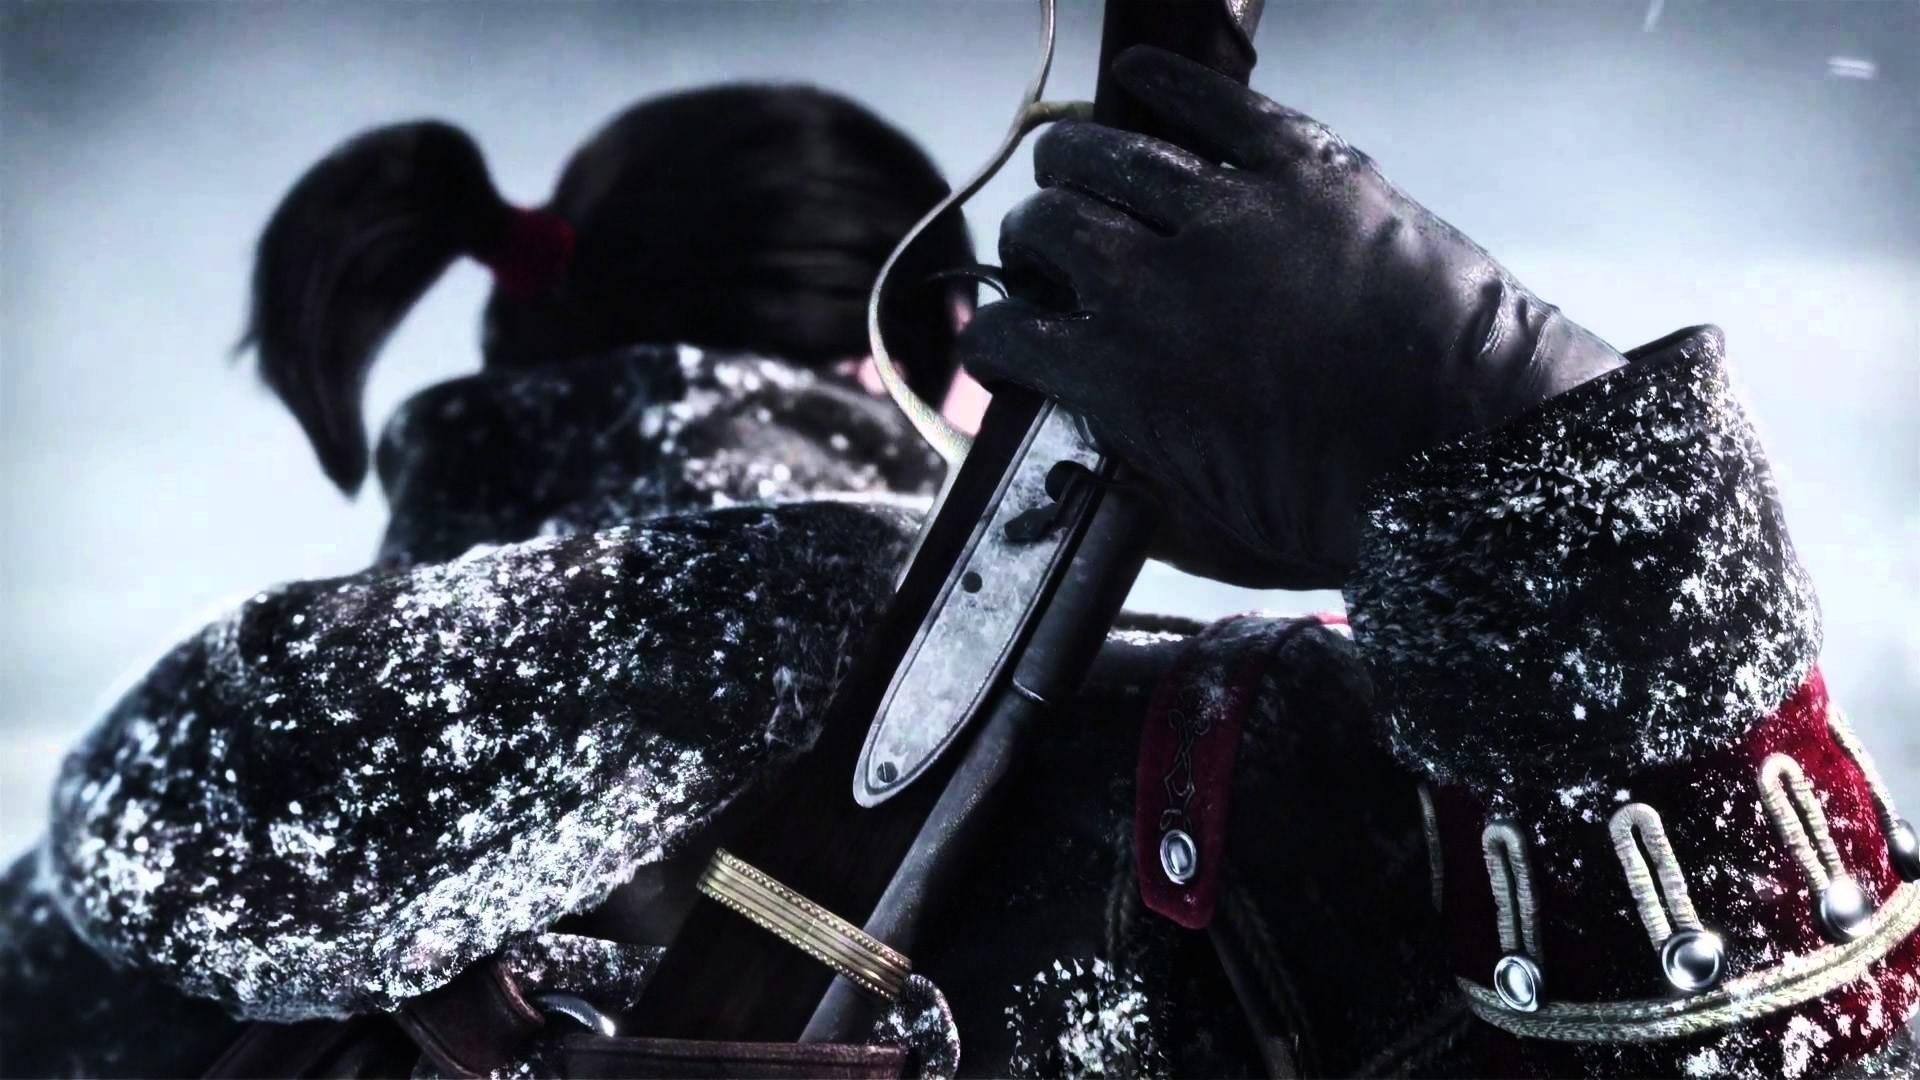 assassins creed rogue backround desktop, (323 kB)